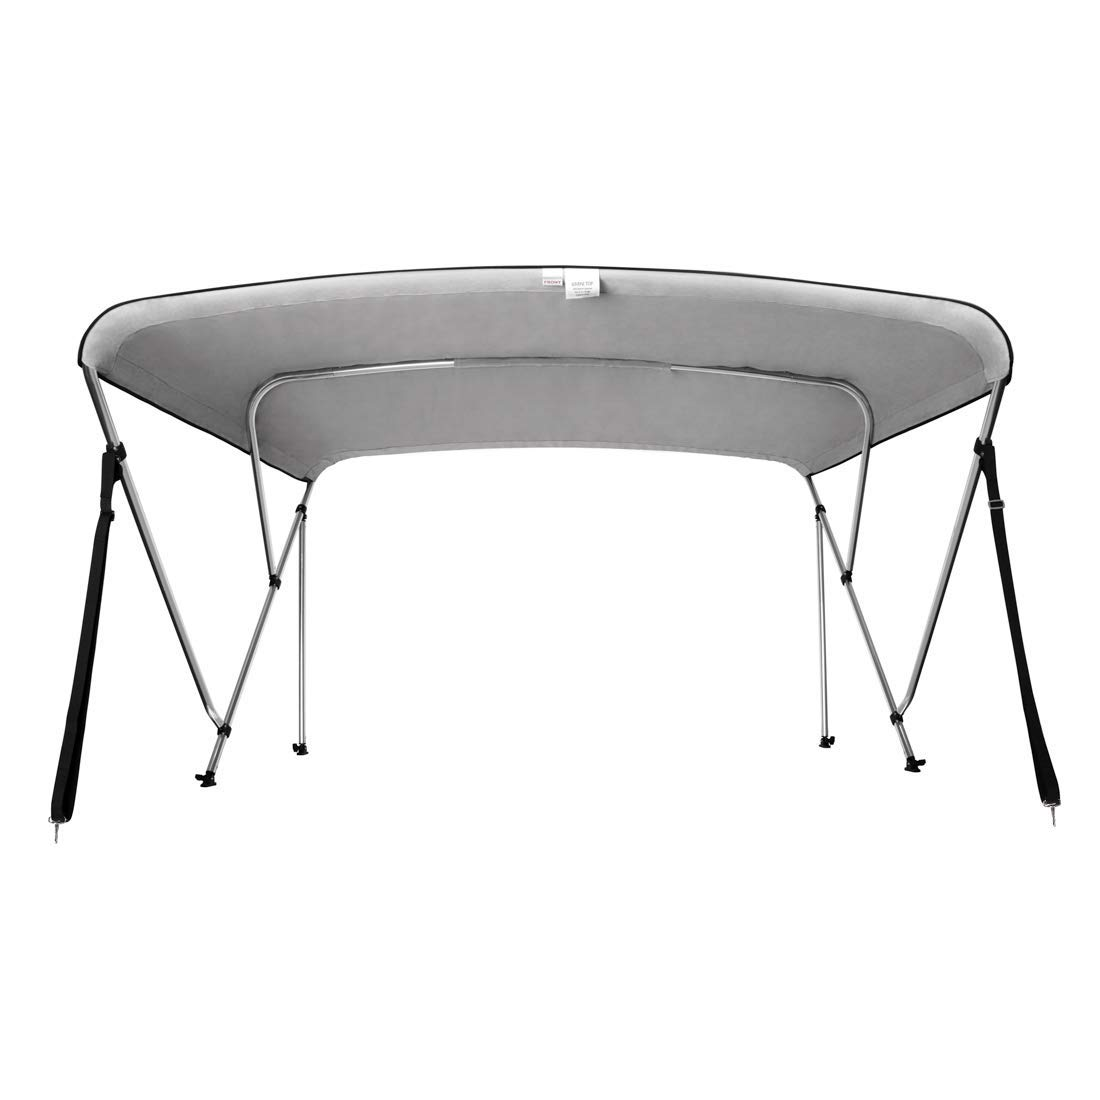 "VIVOHOME 73-78/"" Folding Boat Kayak Bimini Shade Canopy Top Cover Sun Shelter New"